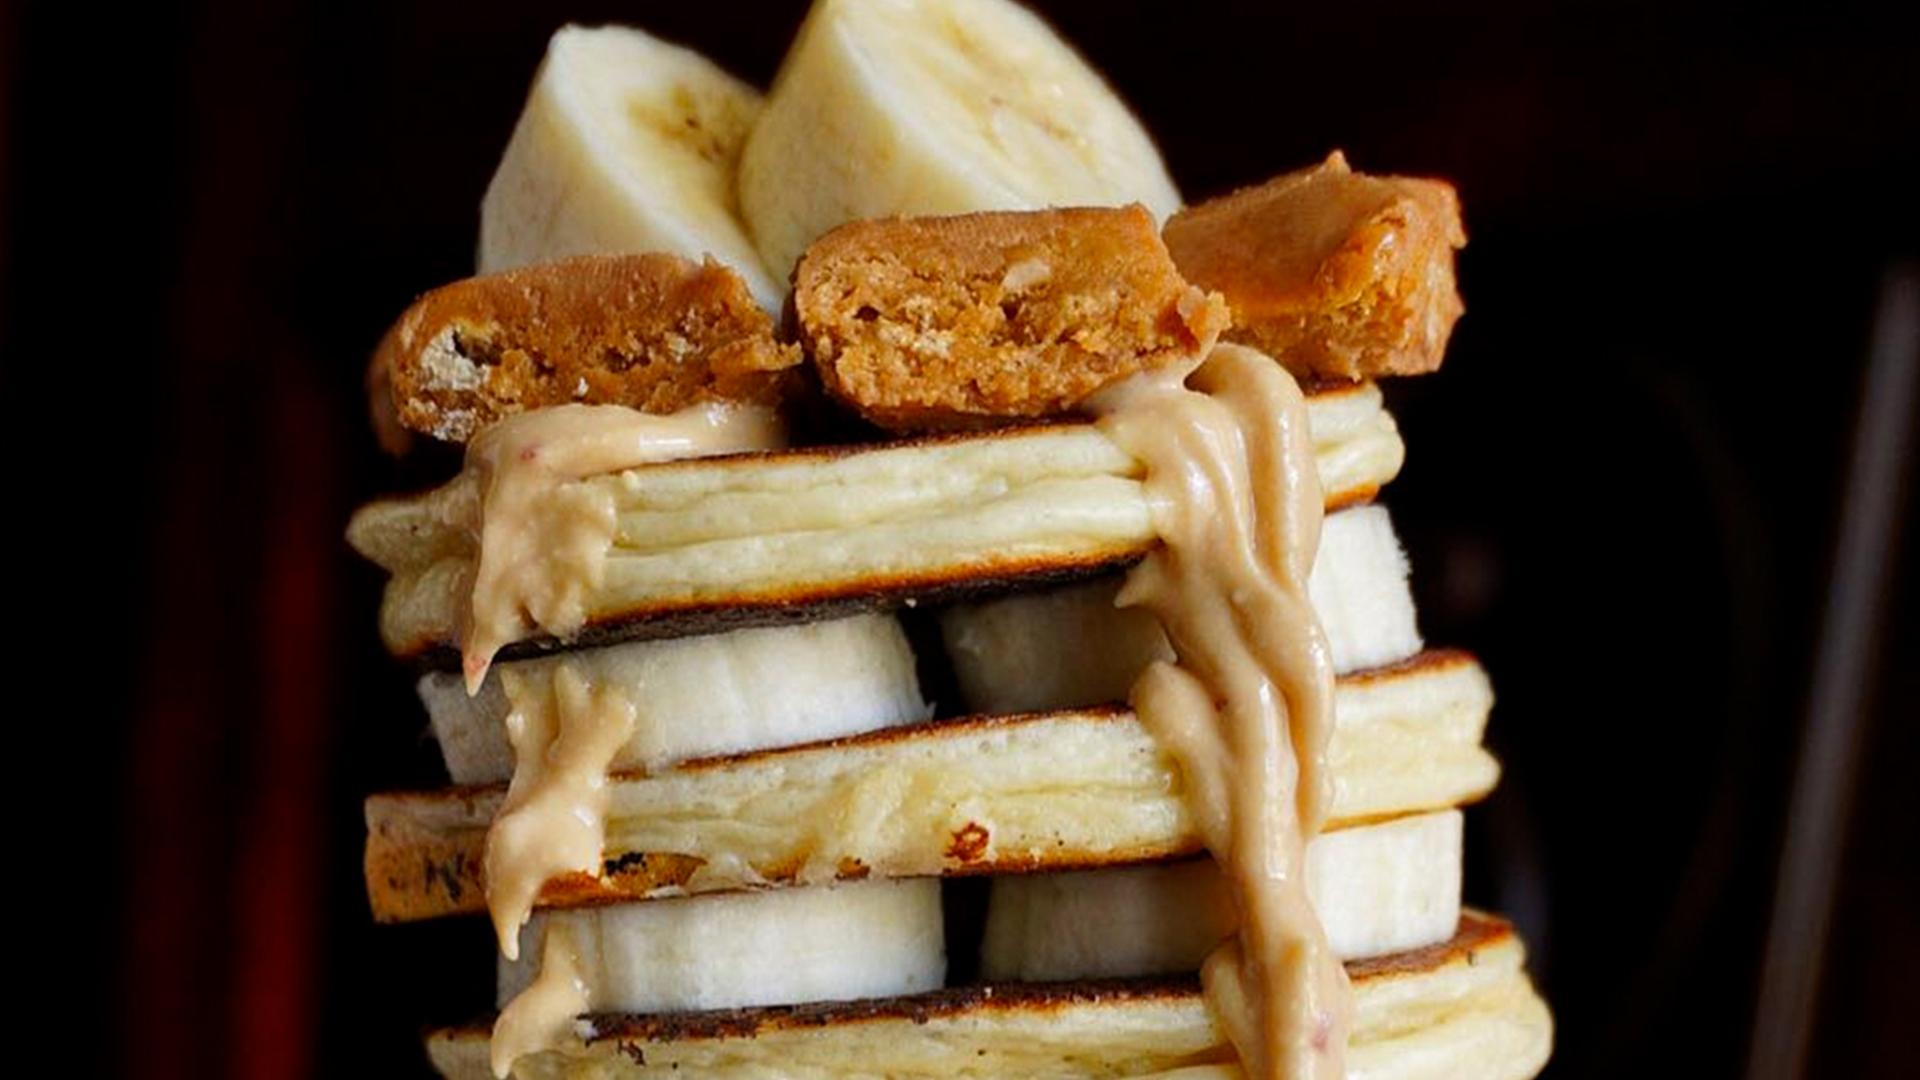 Dymatize Banana Peanut Butter Protein Pancakes